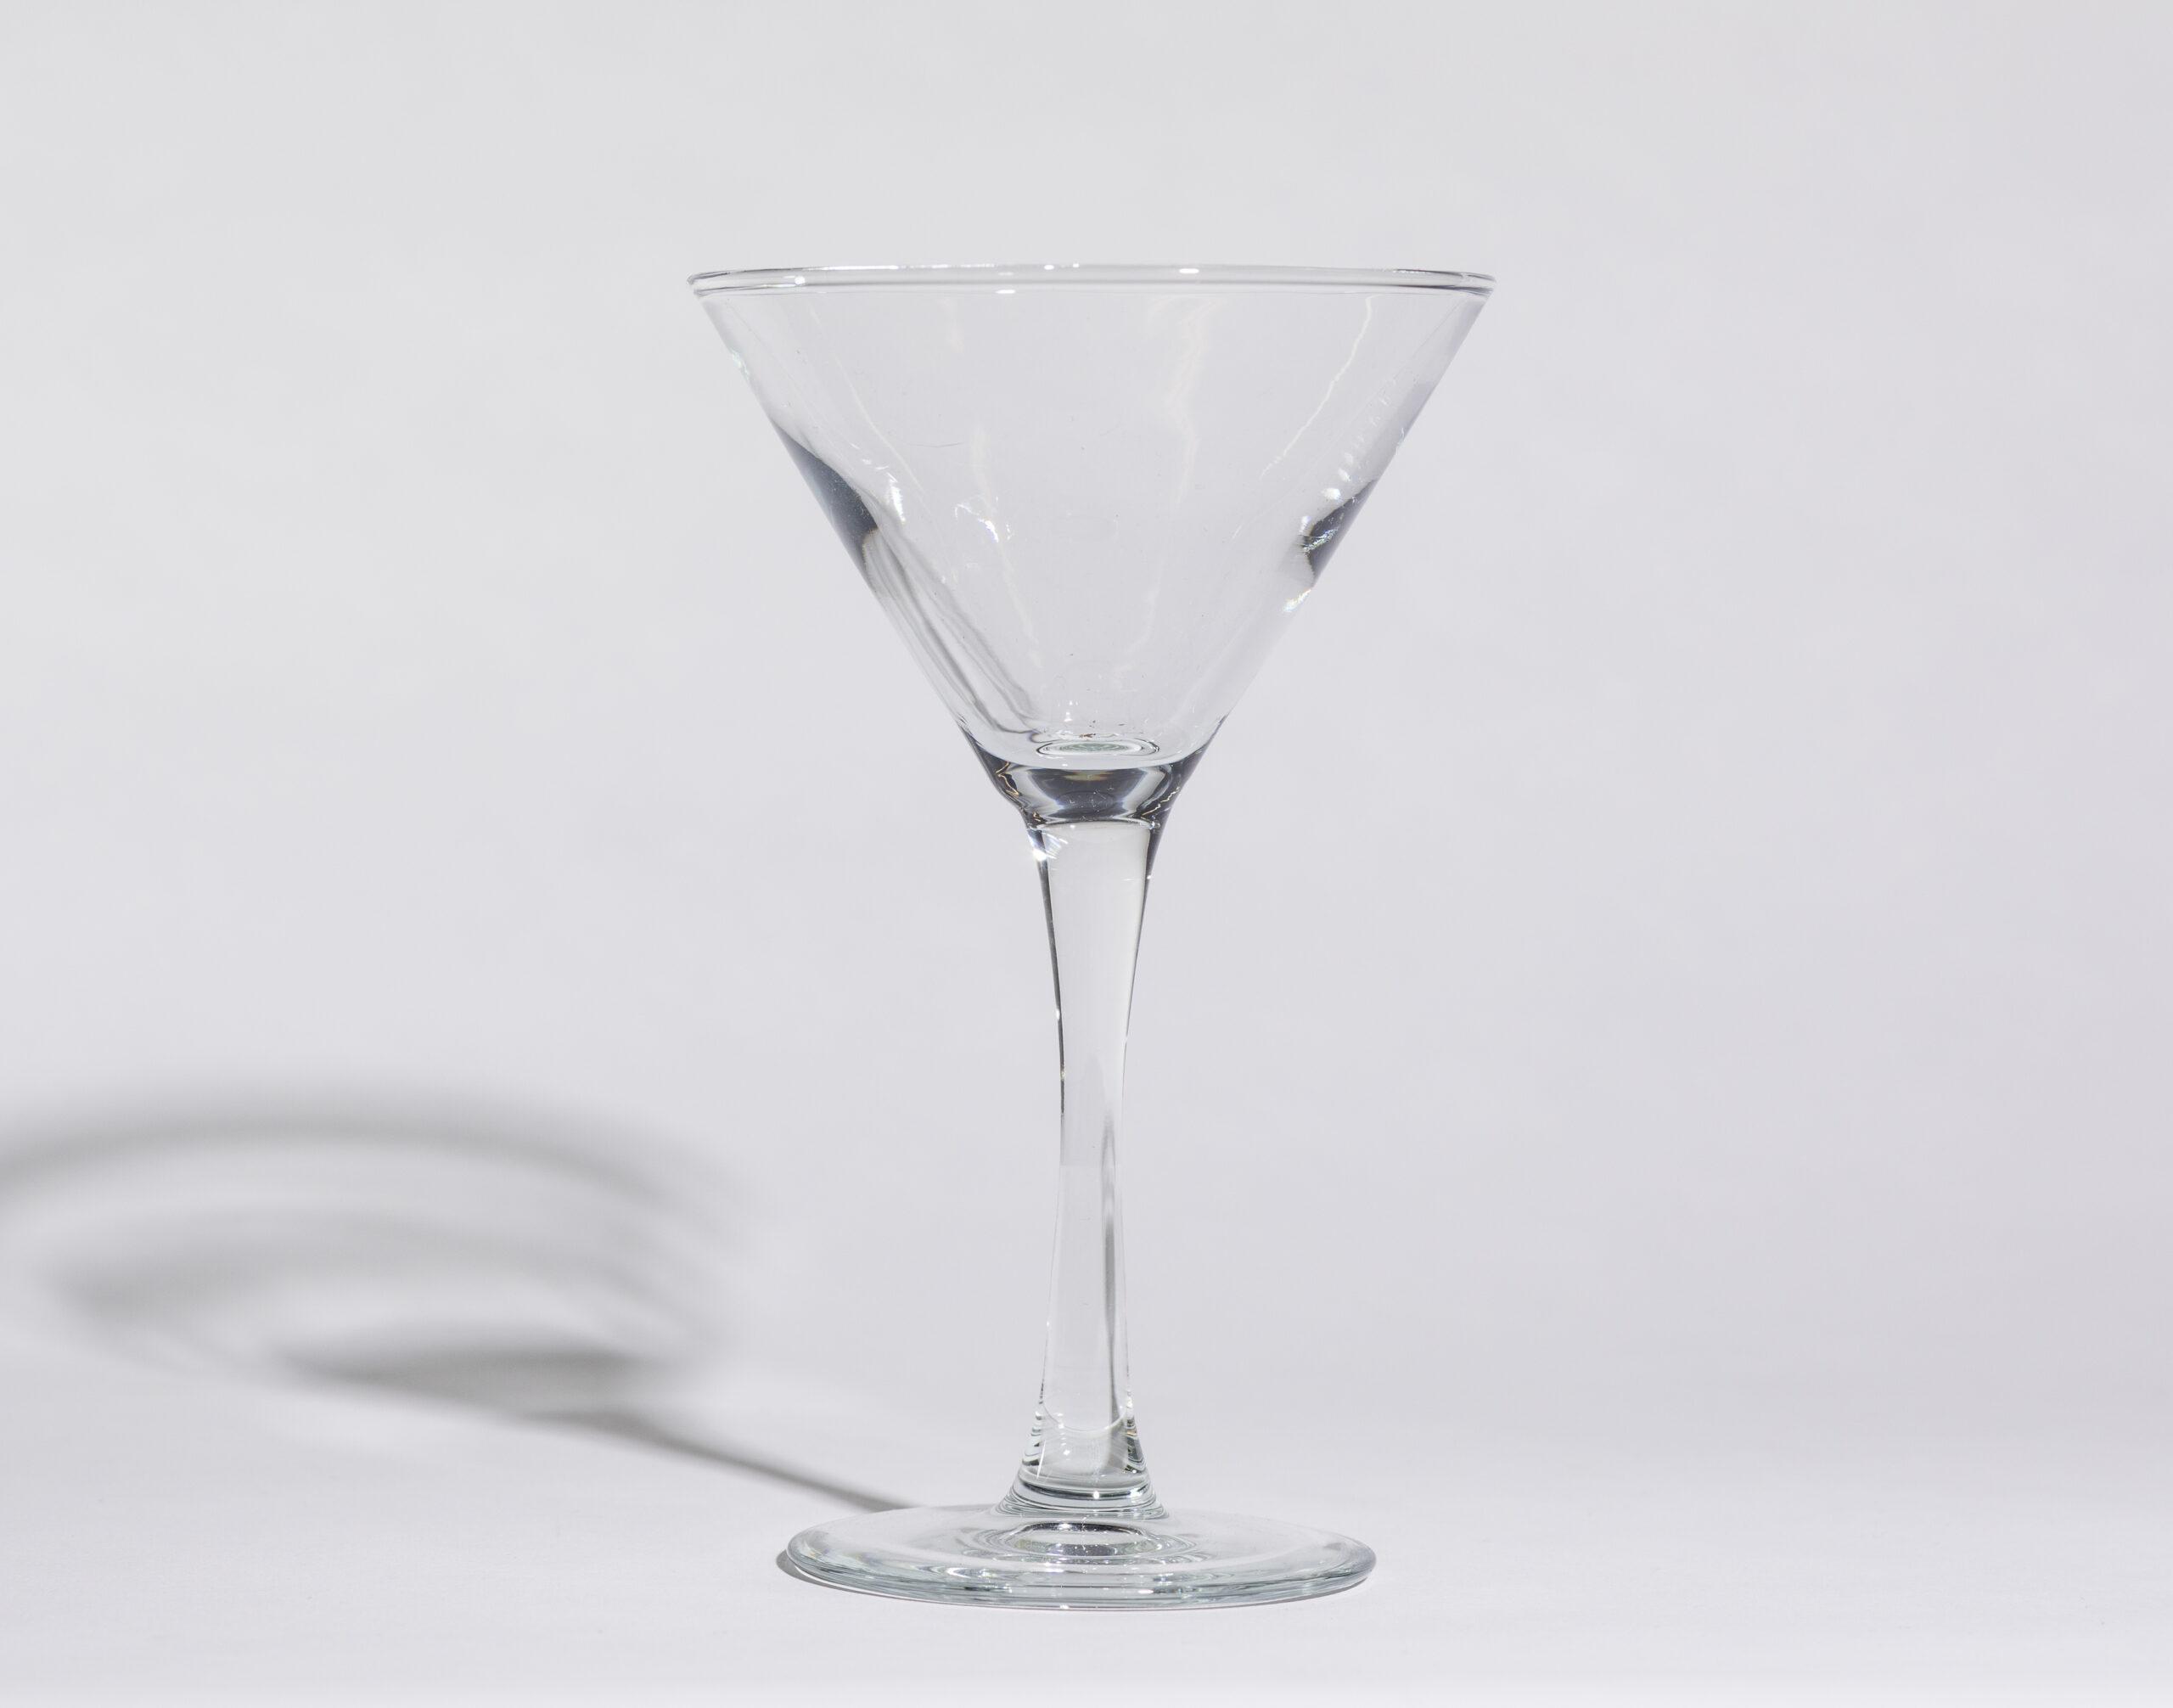 Martini glasses (5oz, stemmed)